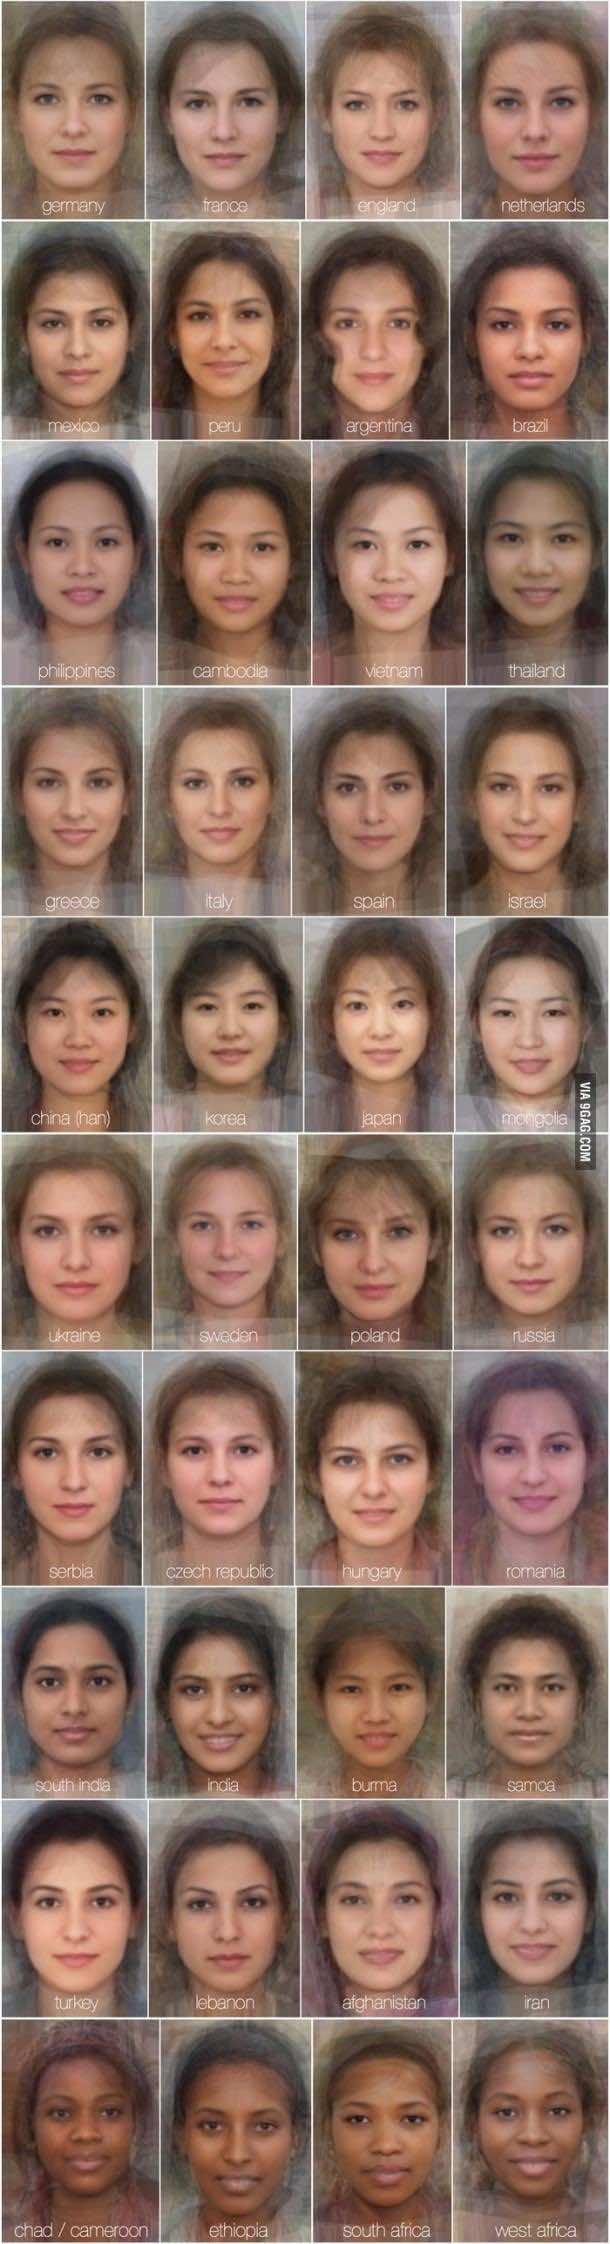 average women faces